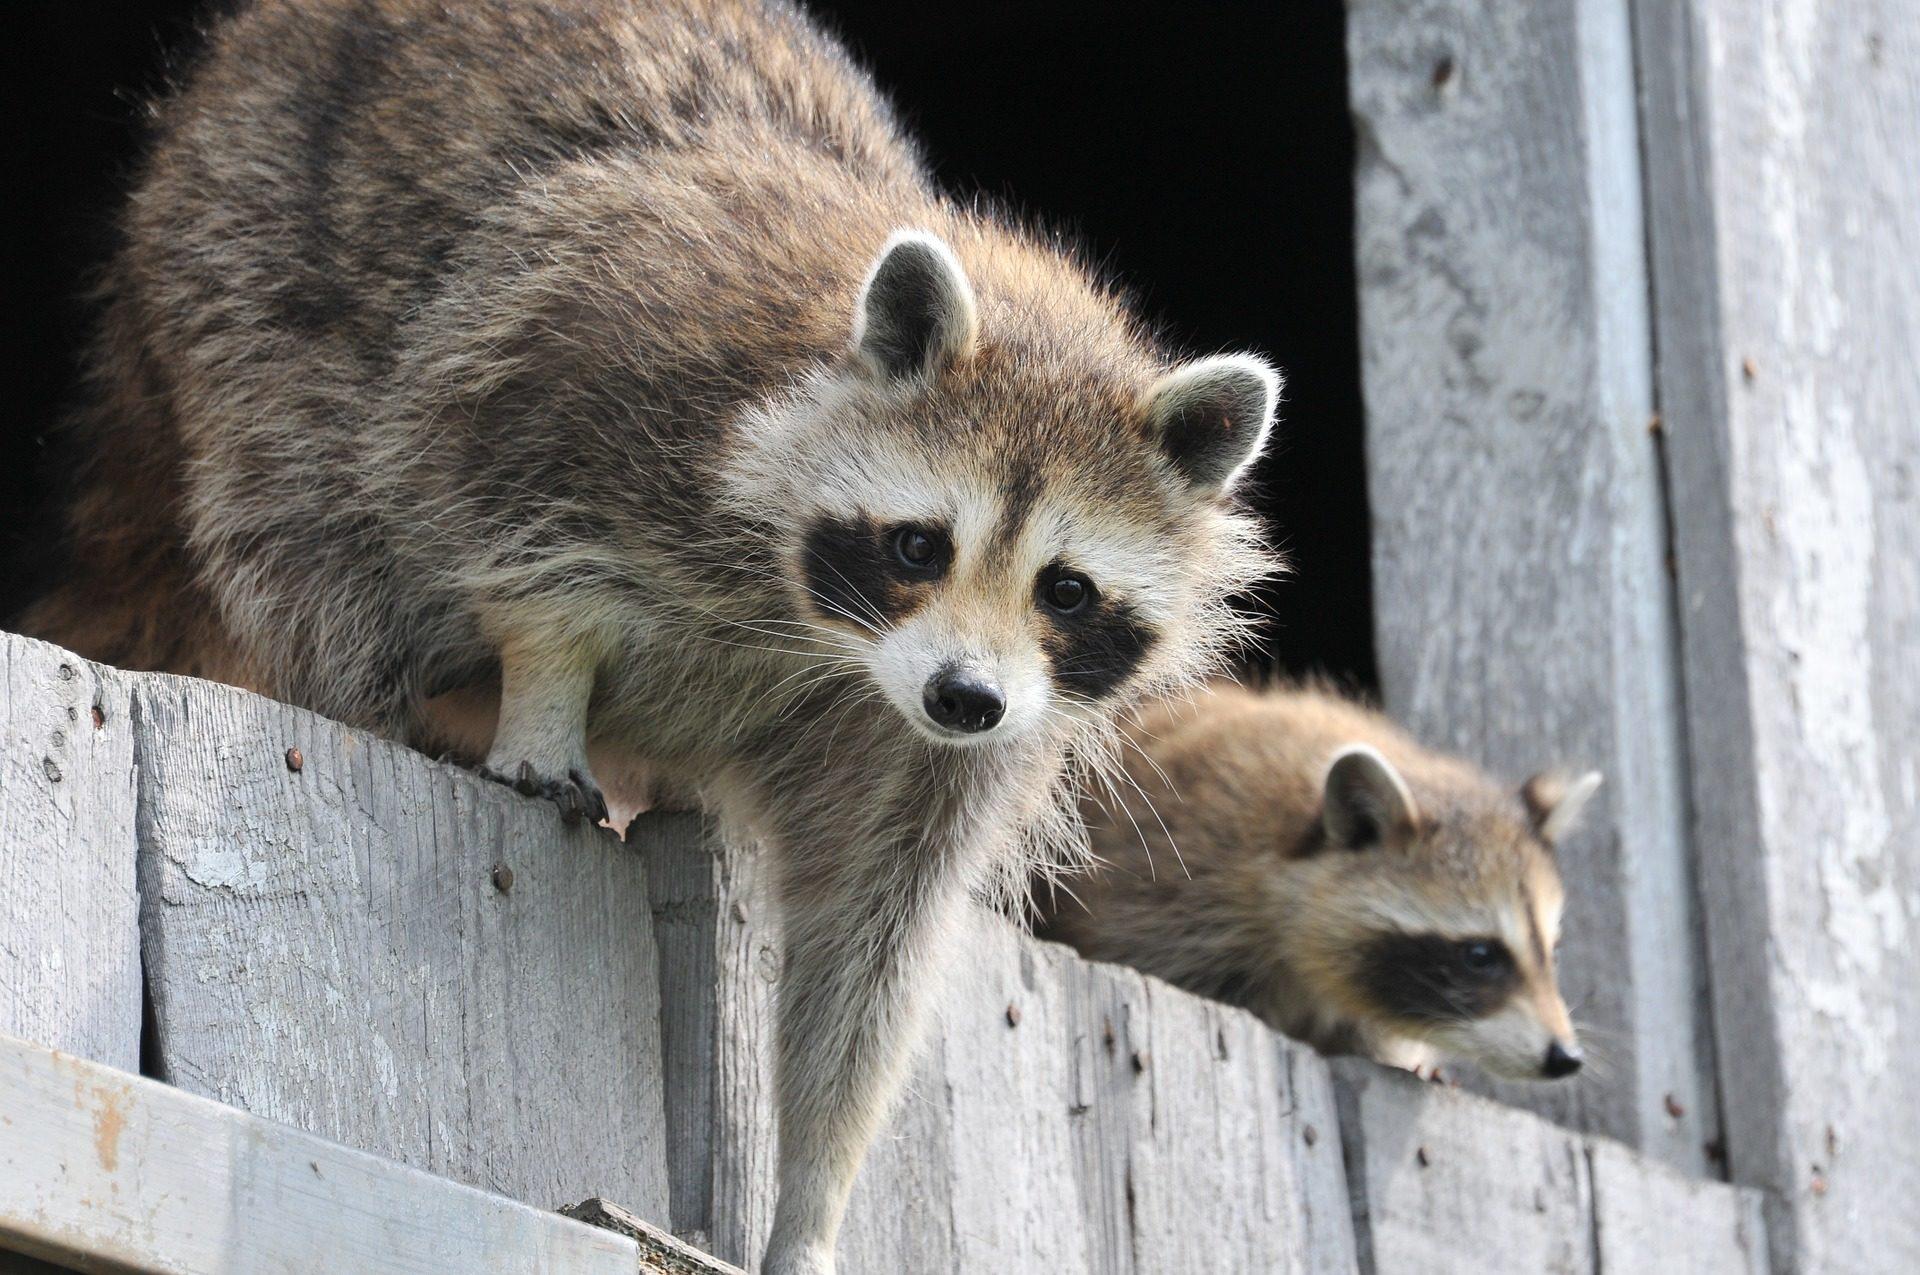 mapaches, salvajes, divertidos, adorables, pareja, pelaje - Fondos de Pantalla HD - professor-falken.com